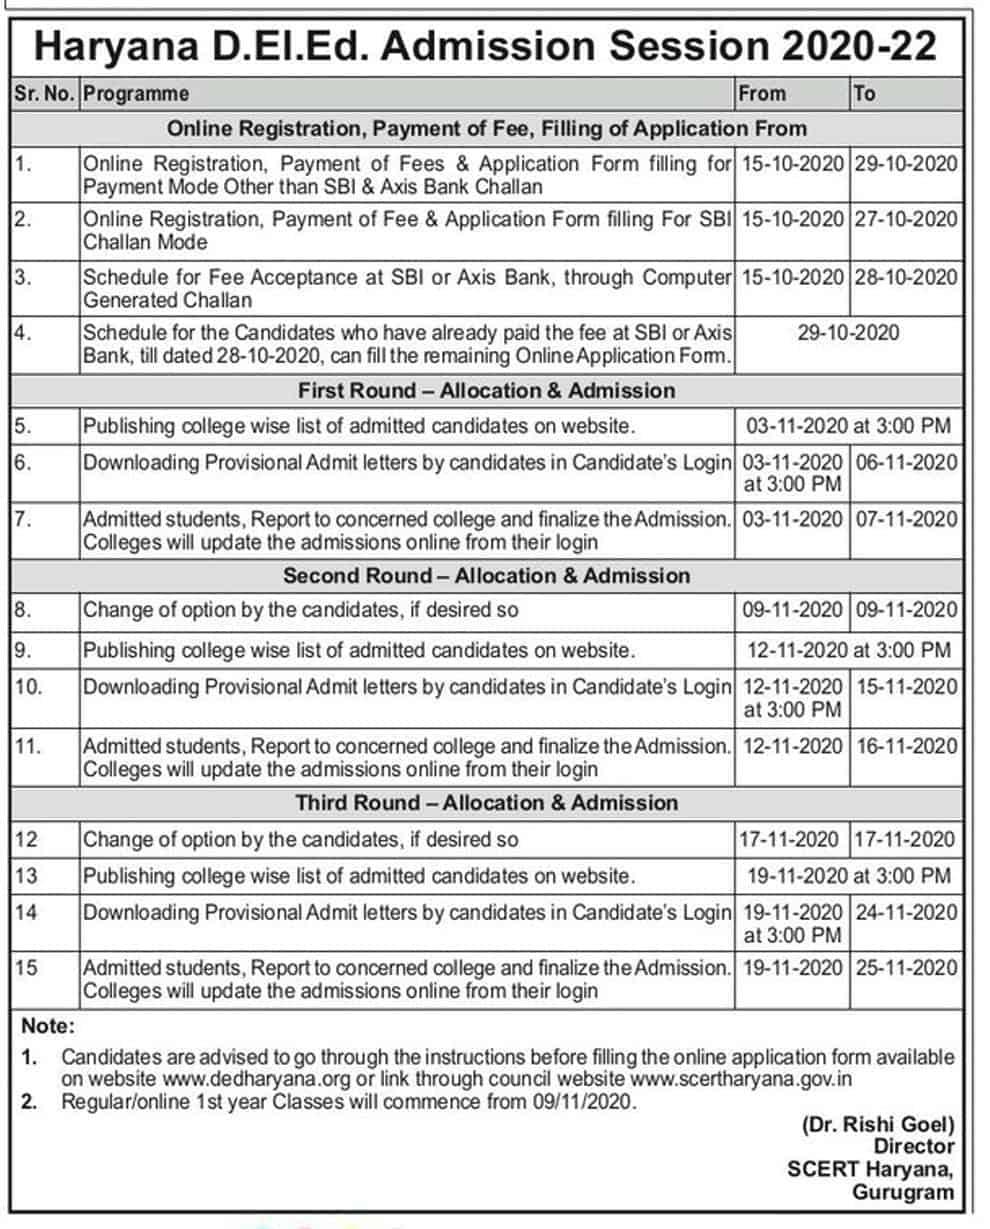 Haryana D.El.Ed Admission Session 2020-22